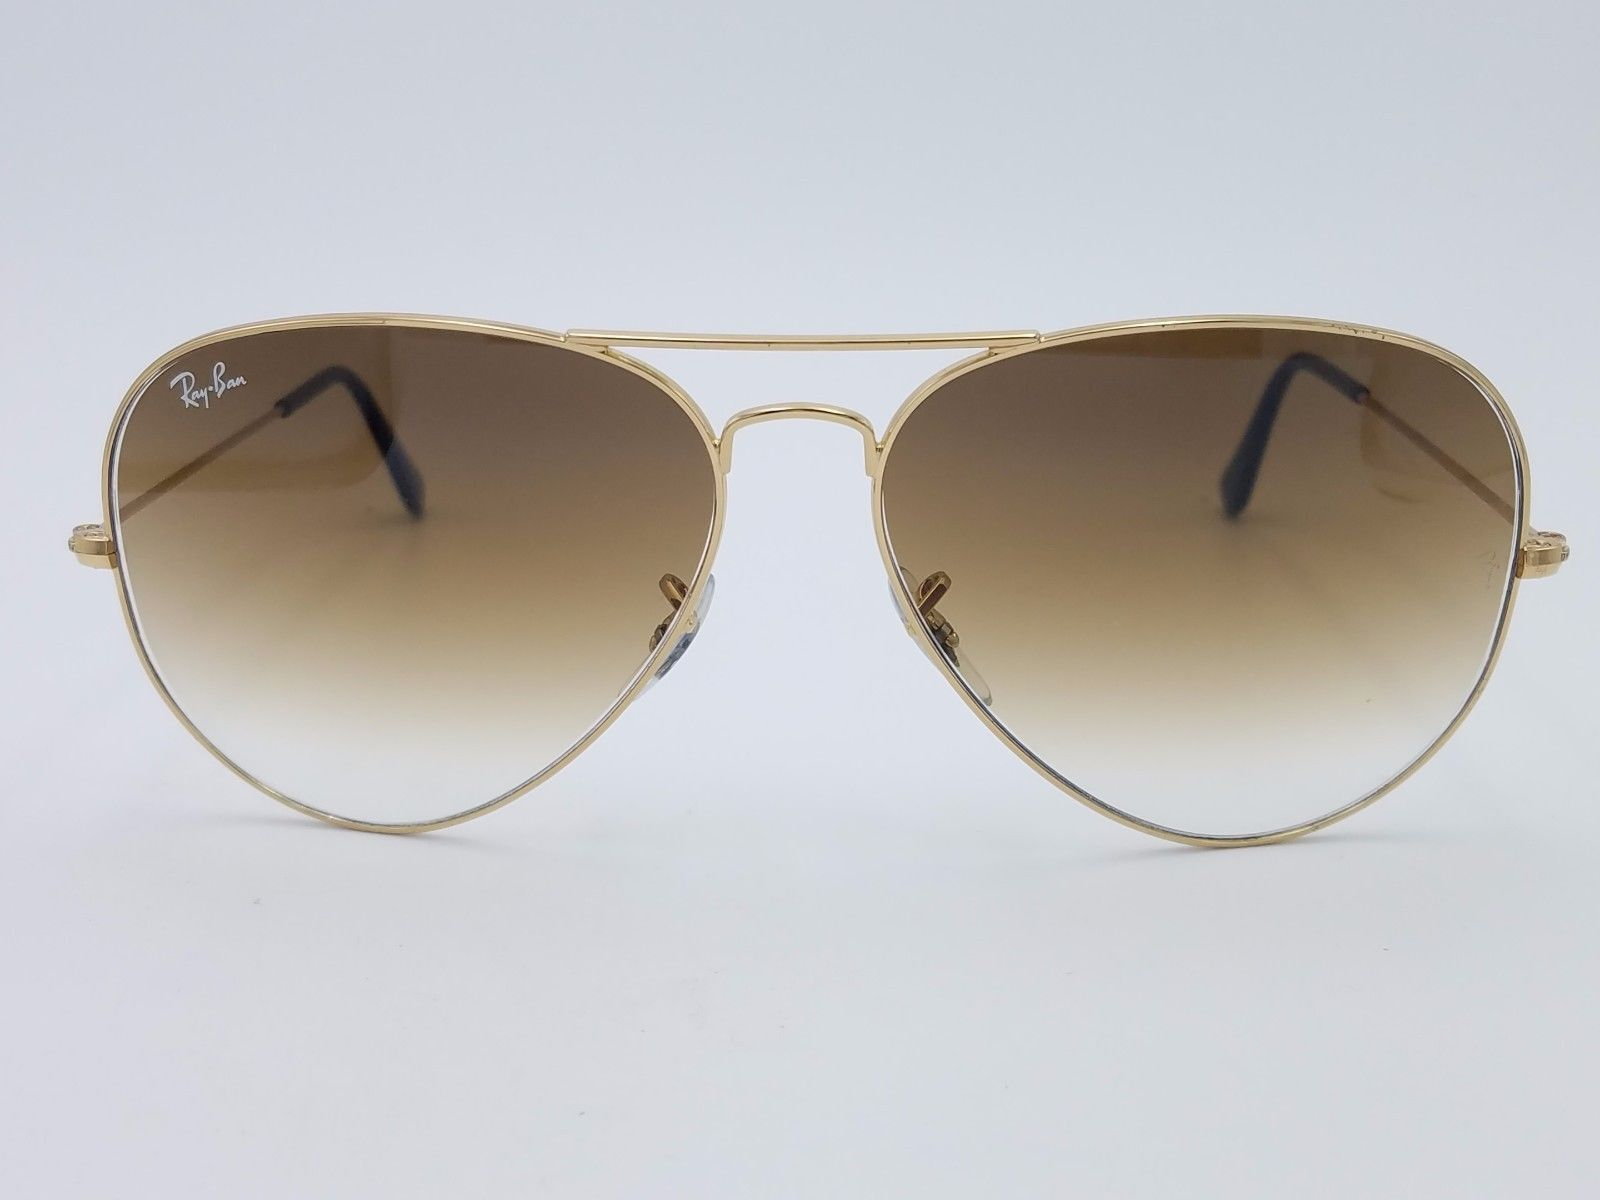 e2e0f949ba1b4 Ray-Ban RB3025 001 3F 55 mm Gold Blue Metal Aviator Sunglasses   eBay